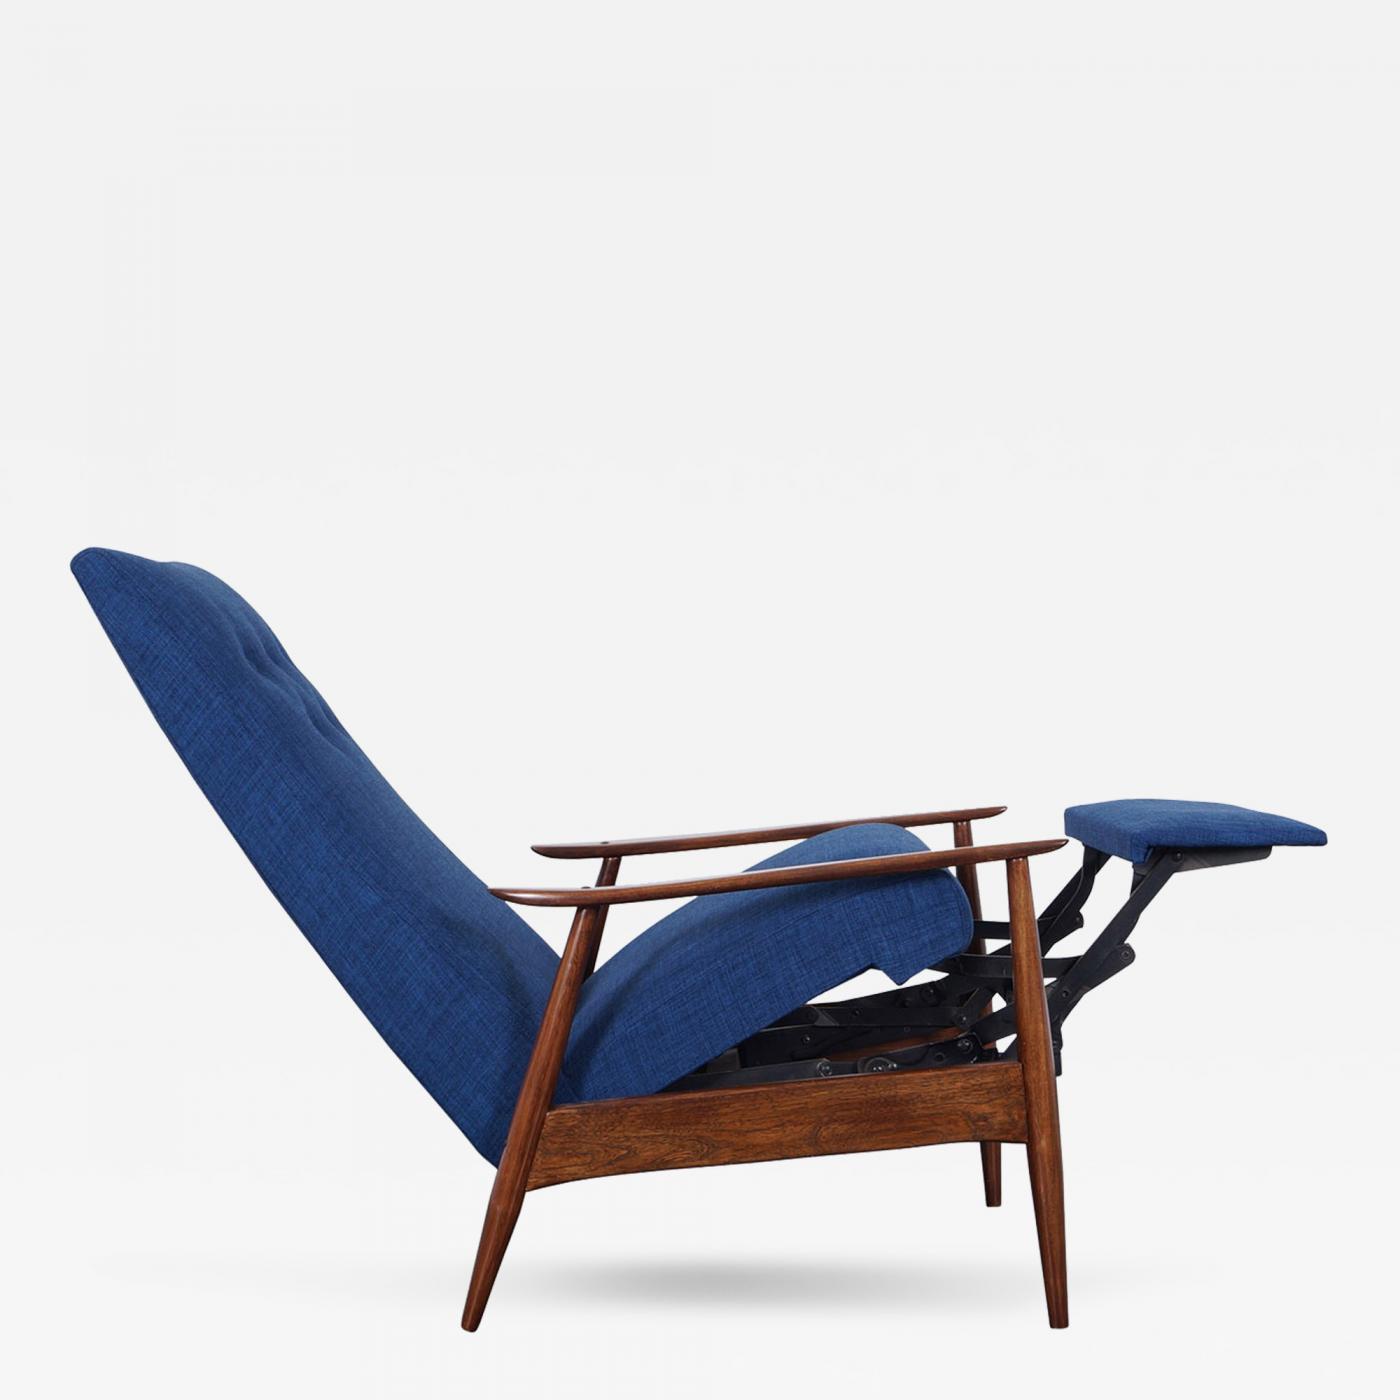 Milo Baughman Vintage Reclining Lounge Chair by Milo Baughman